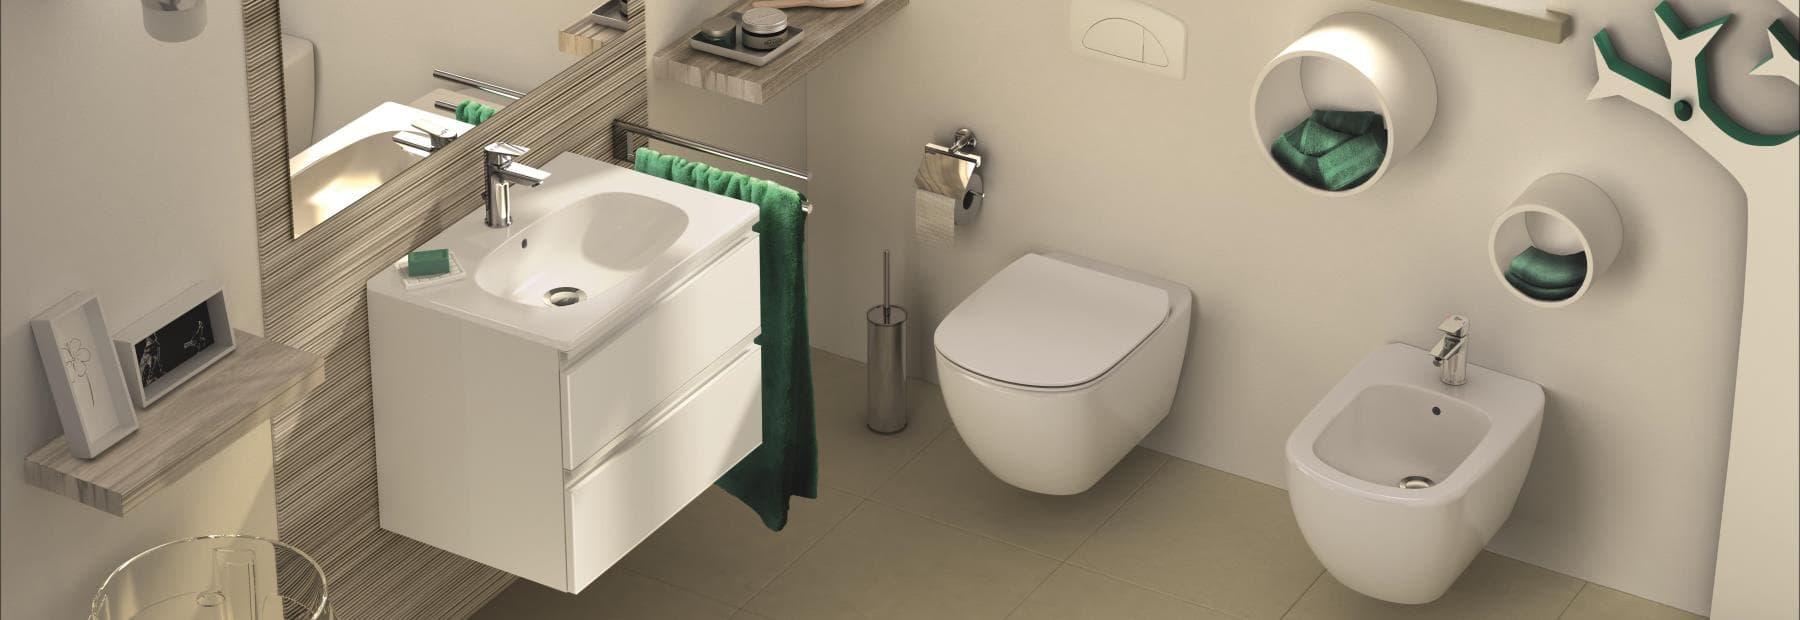 Jaukurai WC rėmo komplektas Viega Eco Plus su unitazu